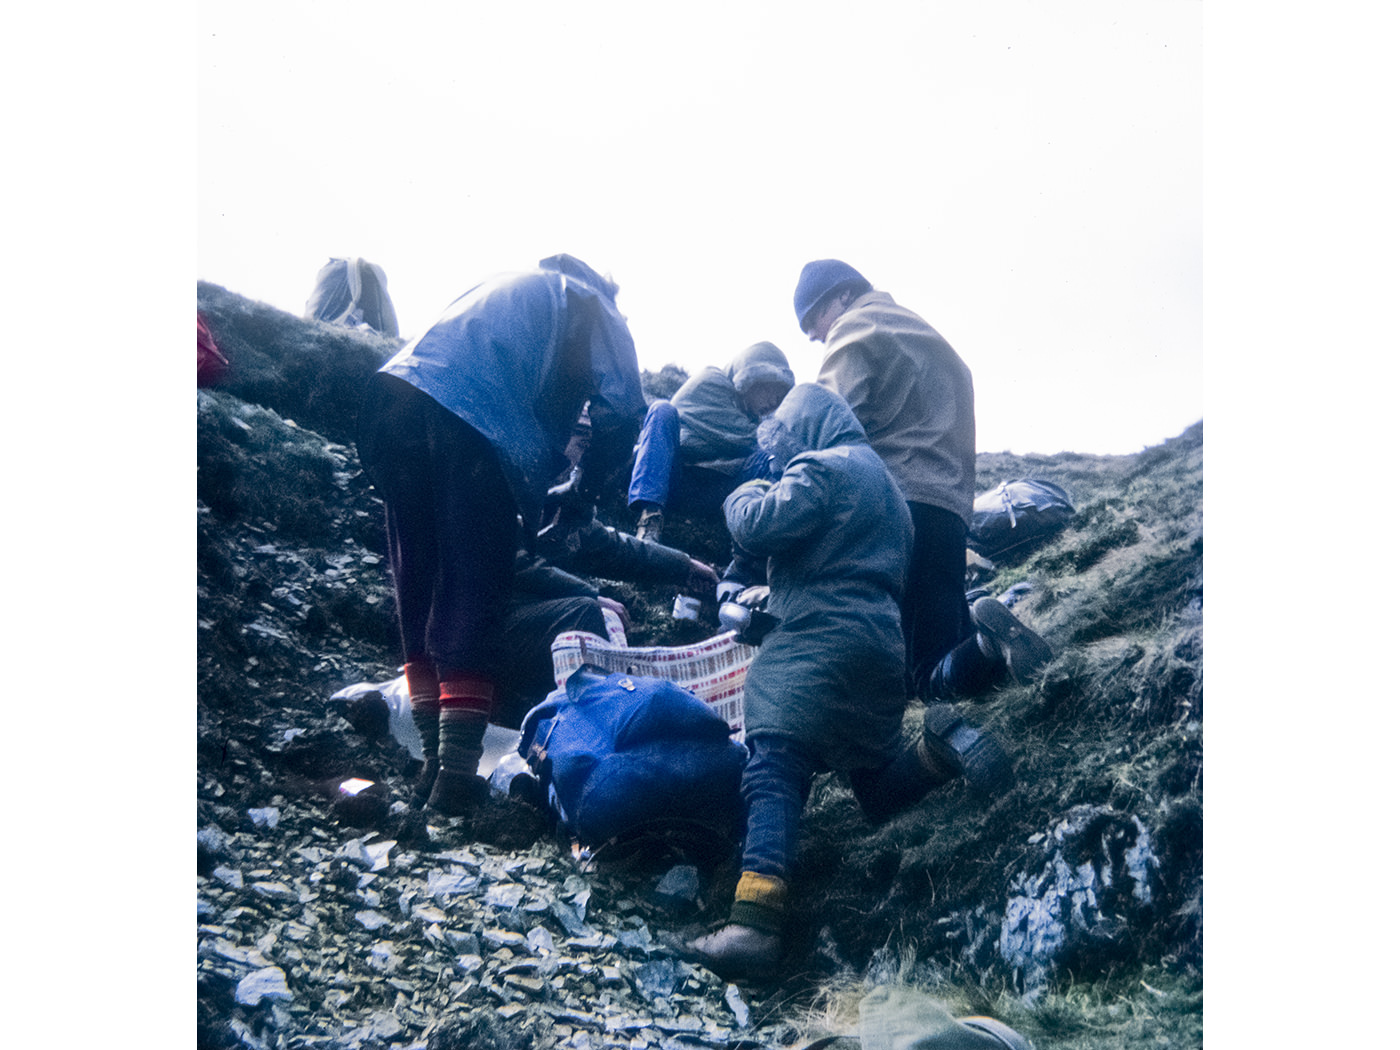 british-boy-scouts-ravine-wales.jpg